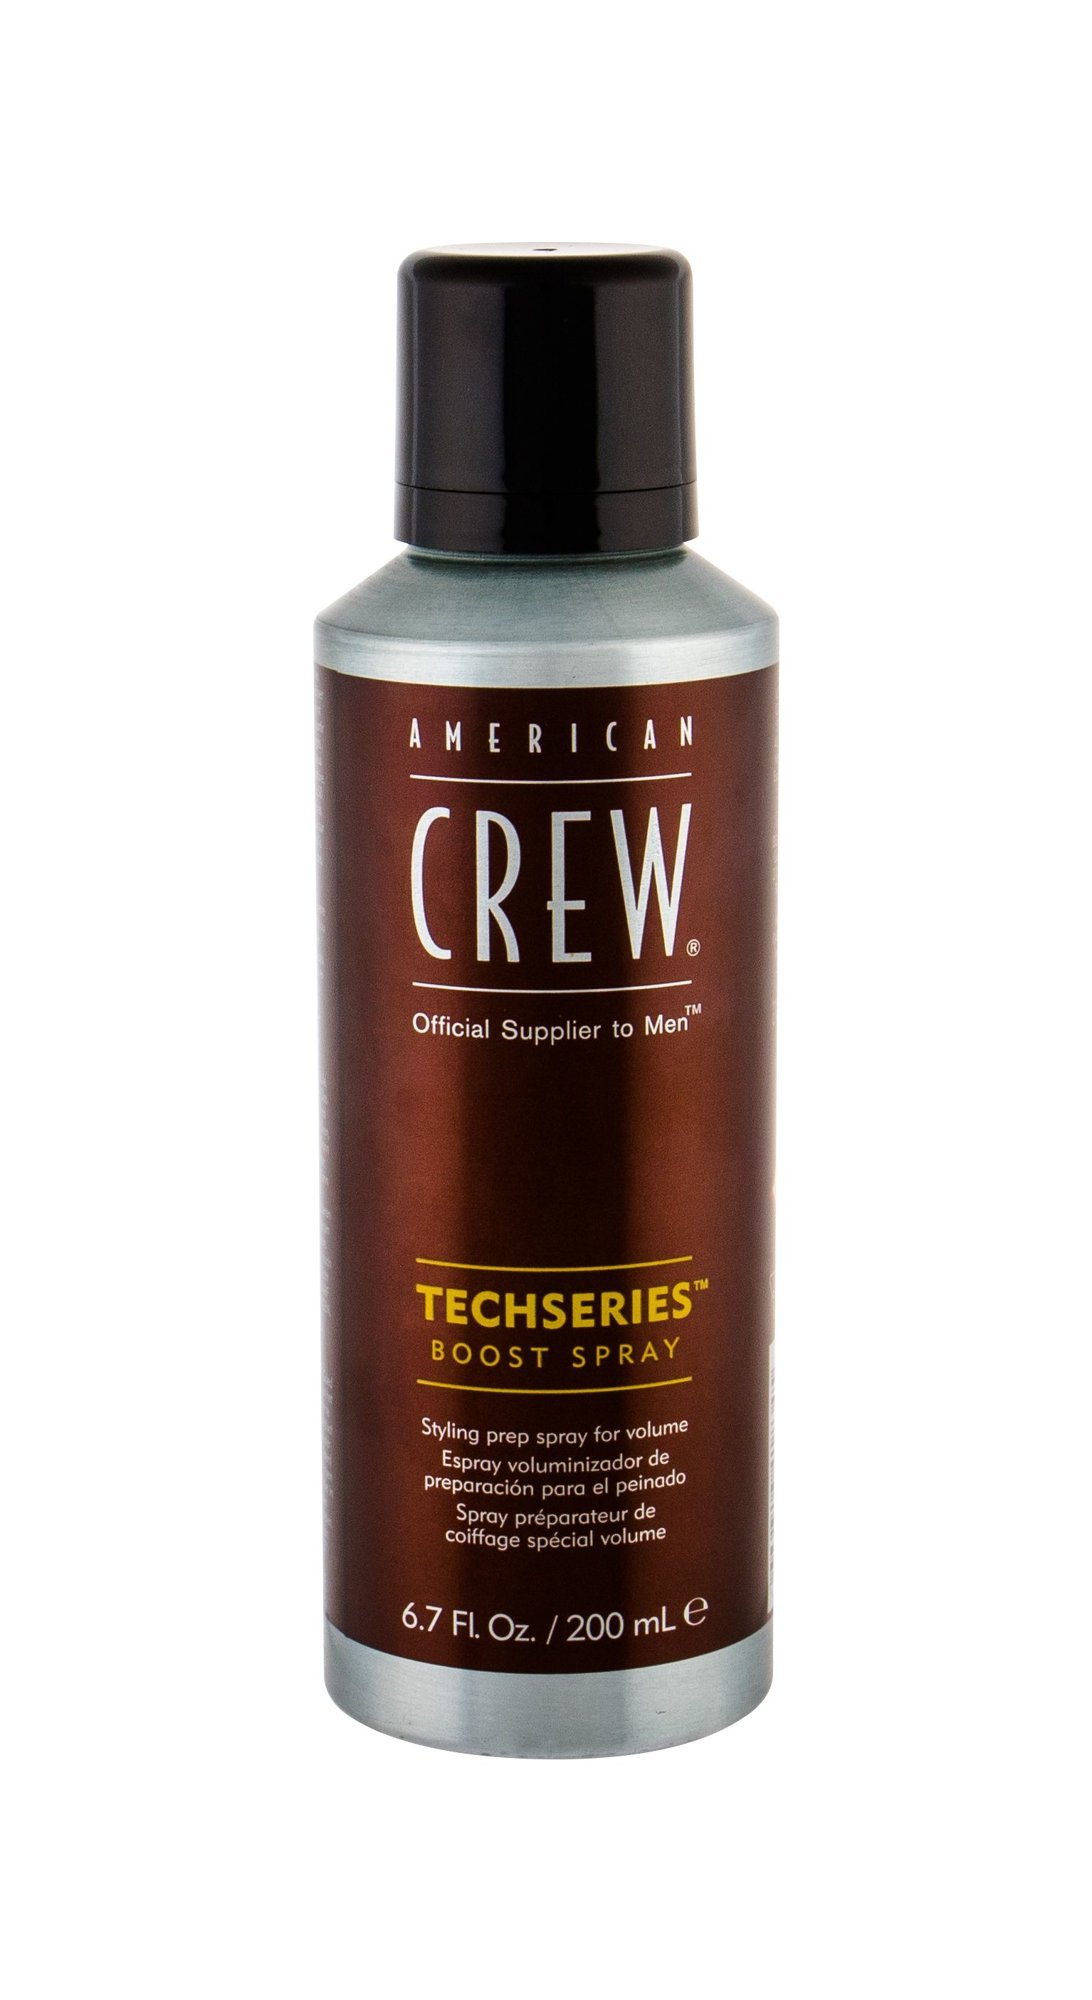 American Crew Techseries Hair Volume 200ml  Boost Spray